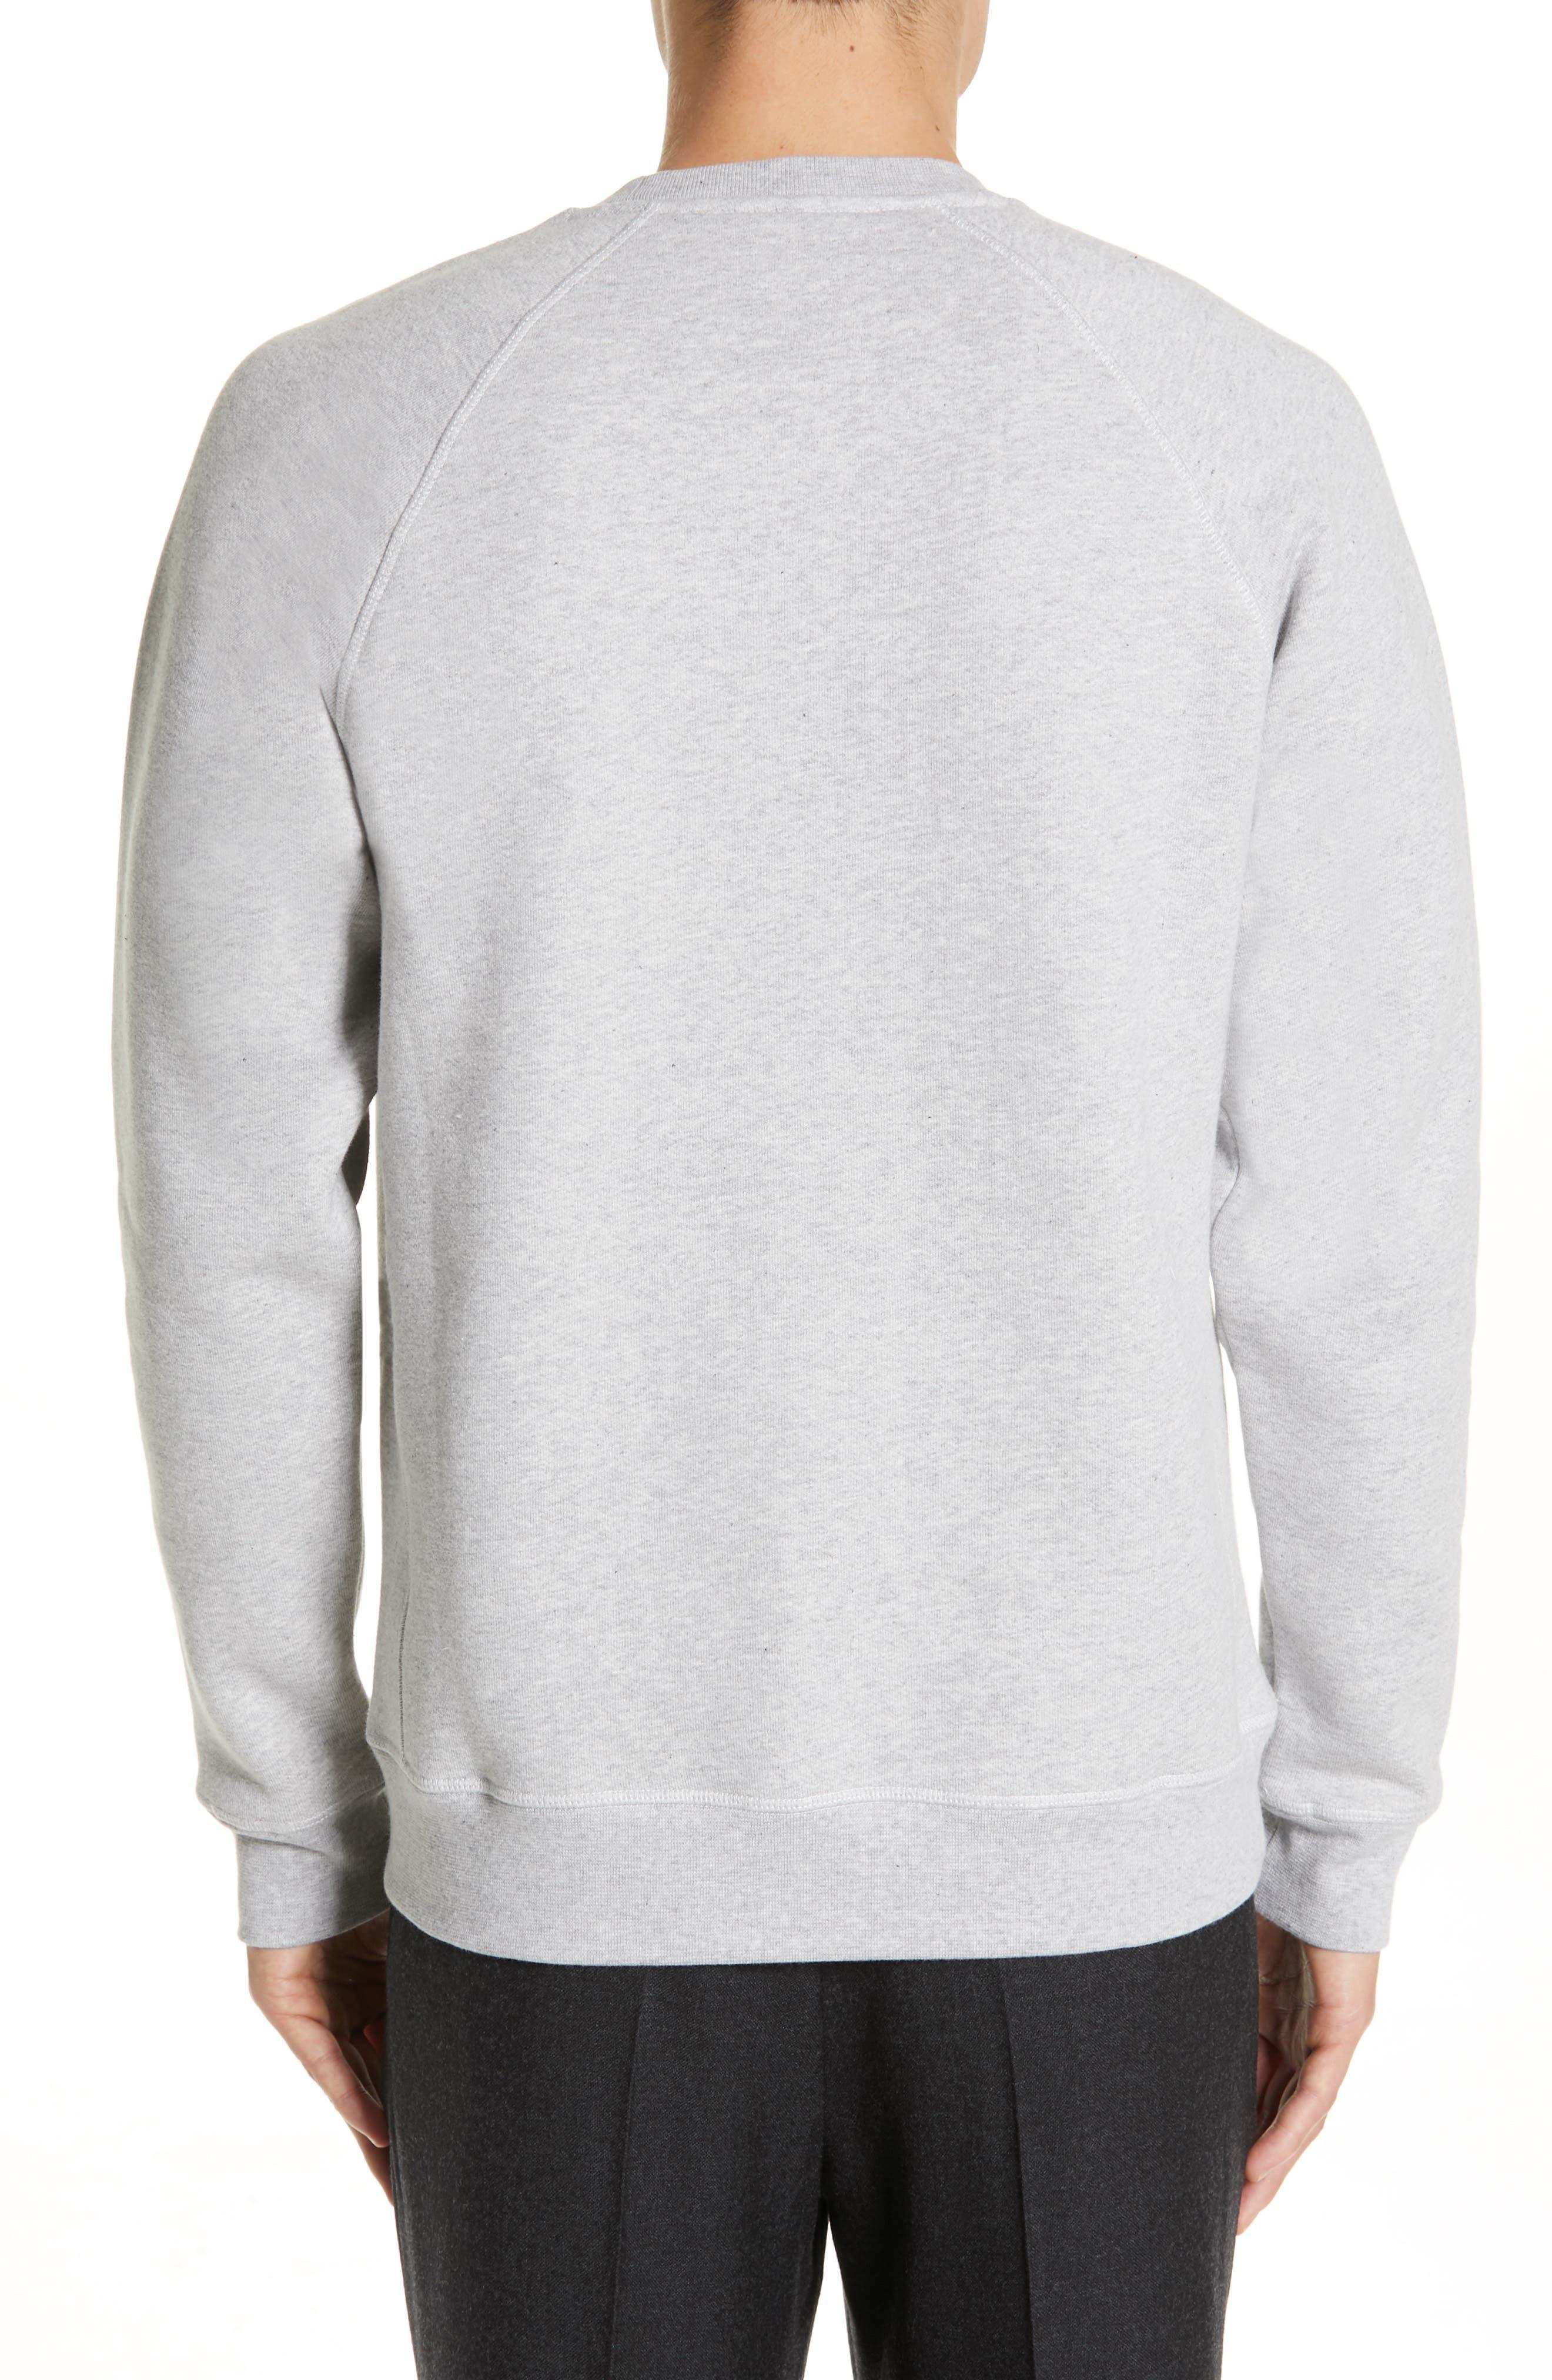 NORSE PROJECTS, Ketel Raglan Sweatshirt, Alternate thumbnail 2, color, LIGHT GREY MELANGE